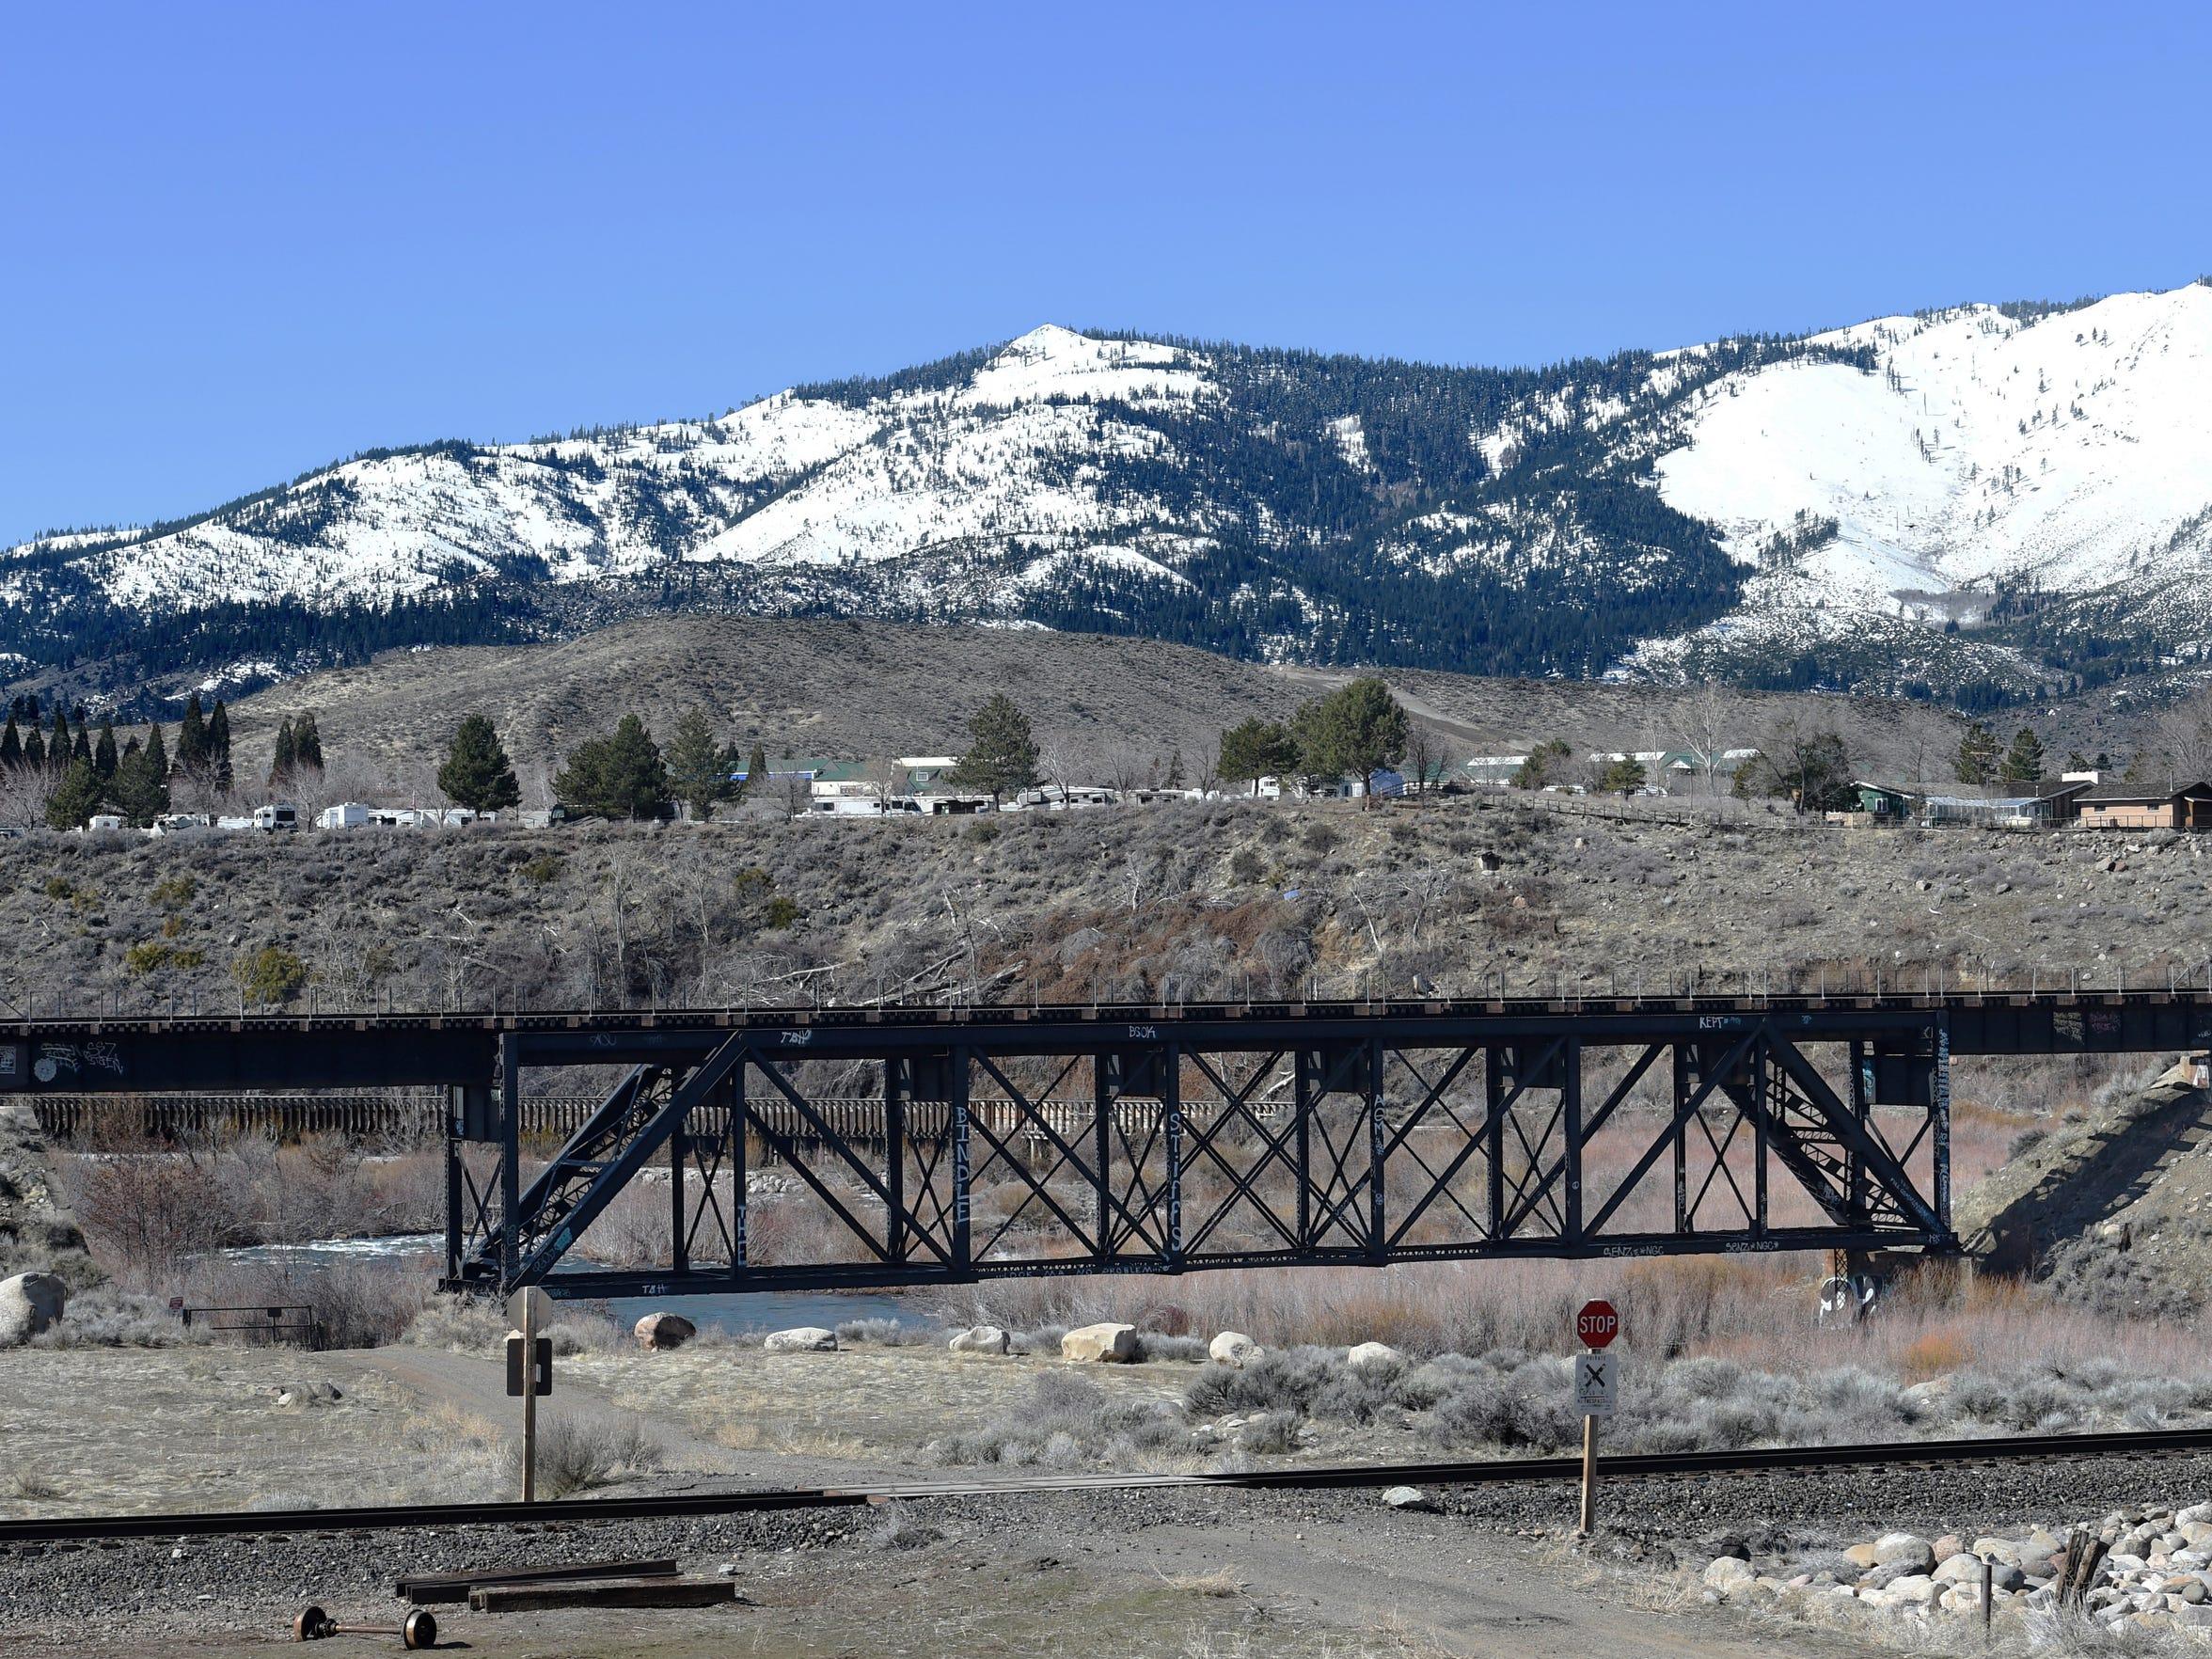 Both railroad tracks near the I-80 in Verdi. Photographed